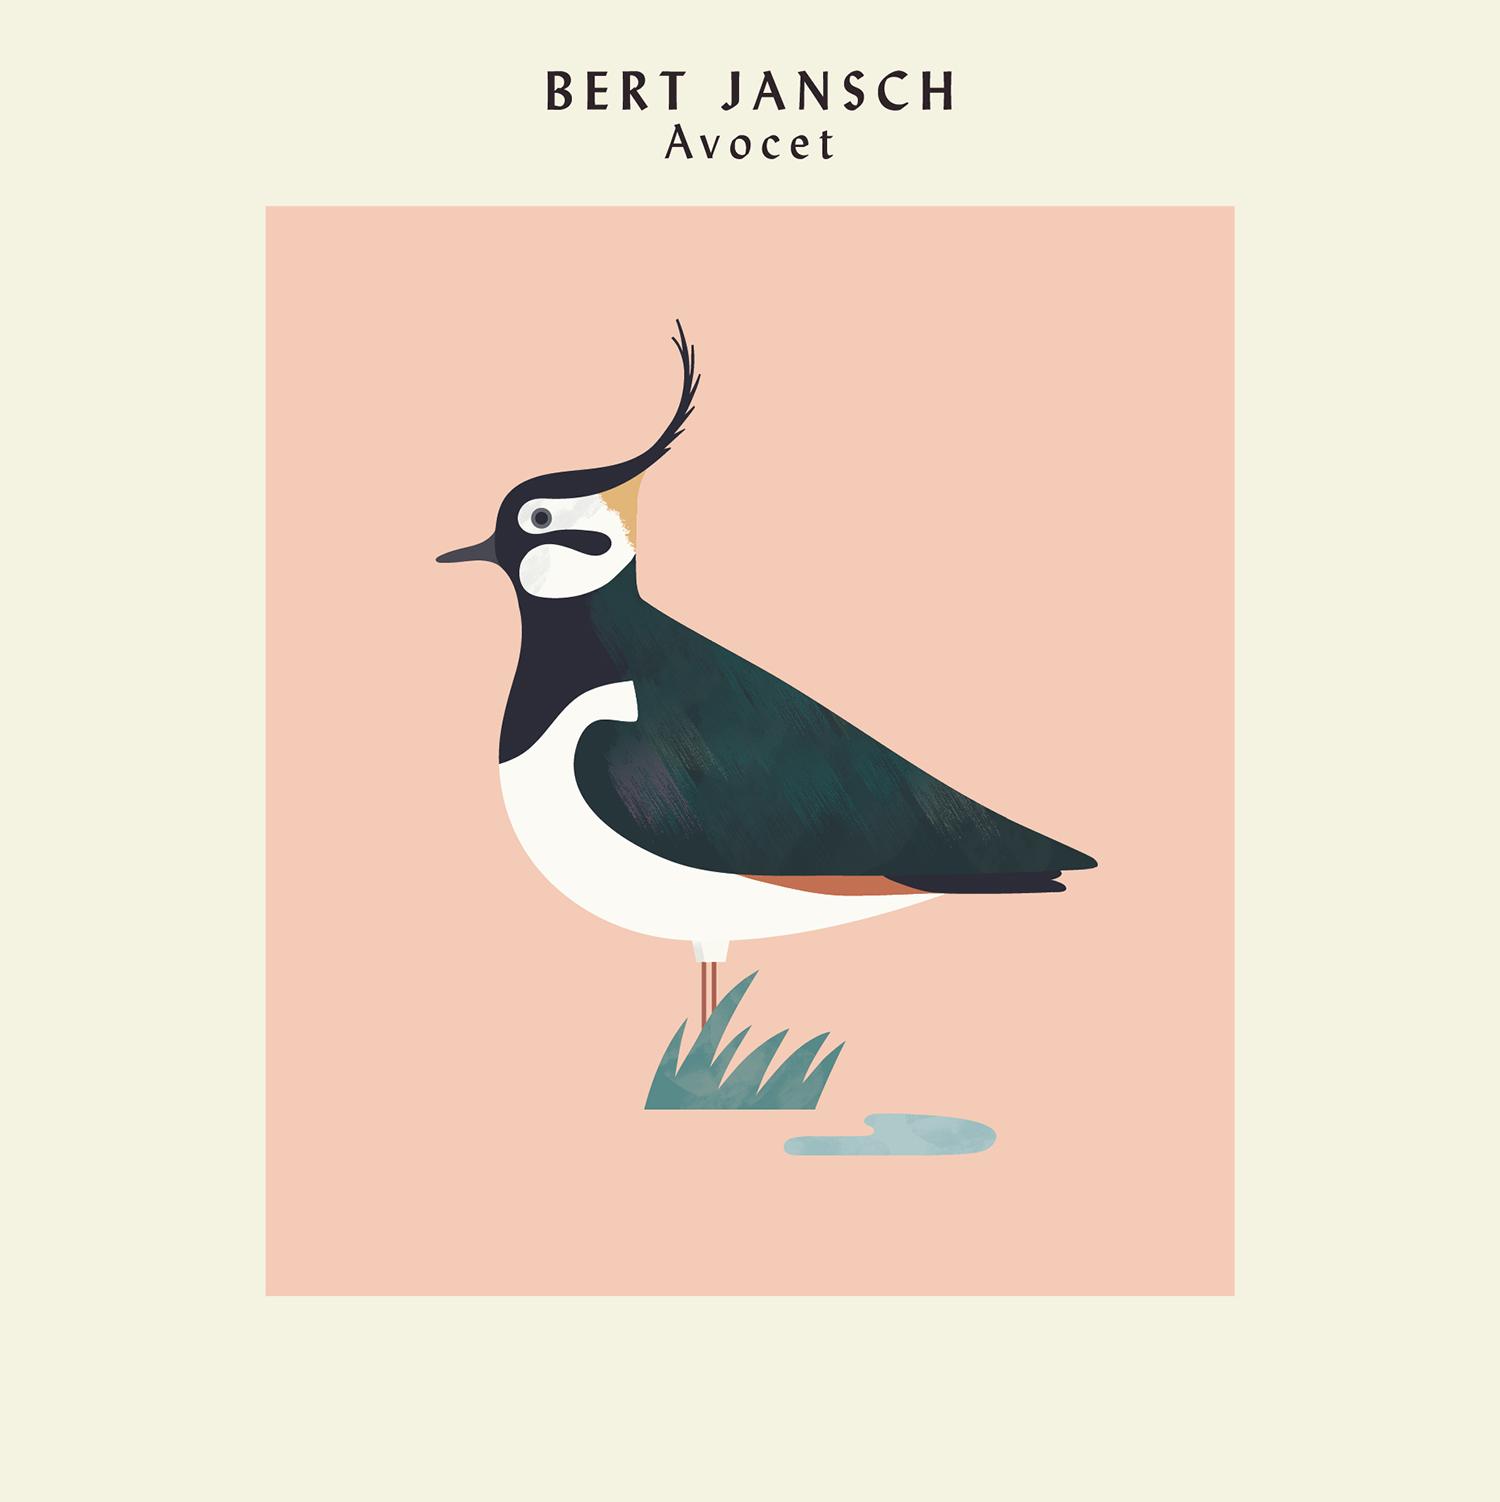 hannah-alice-bert-jansch-lapwing-record-bird-illustration.jpg